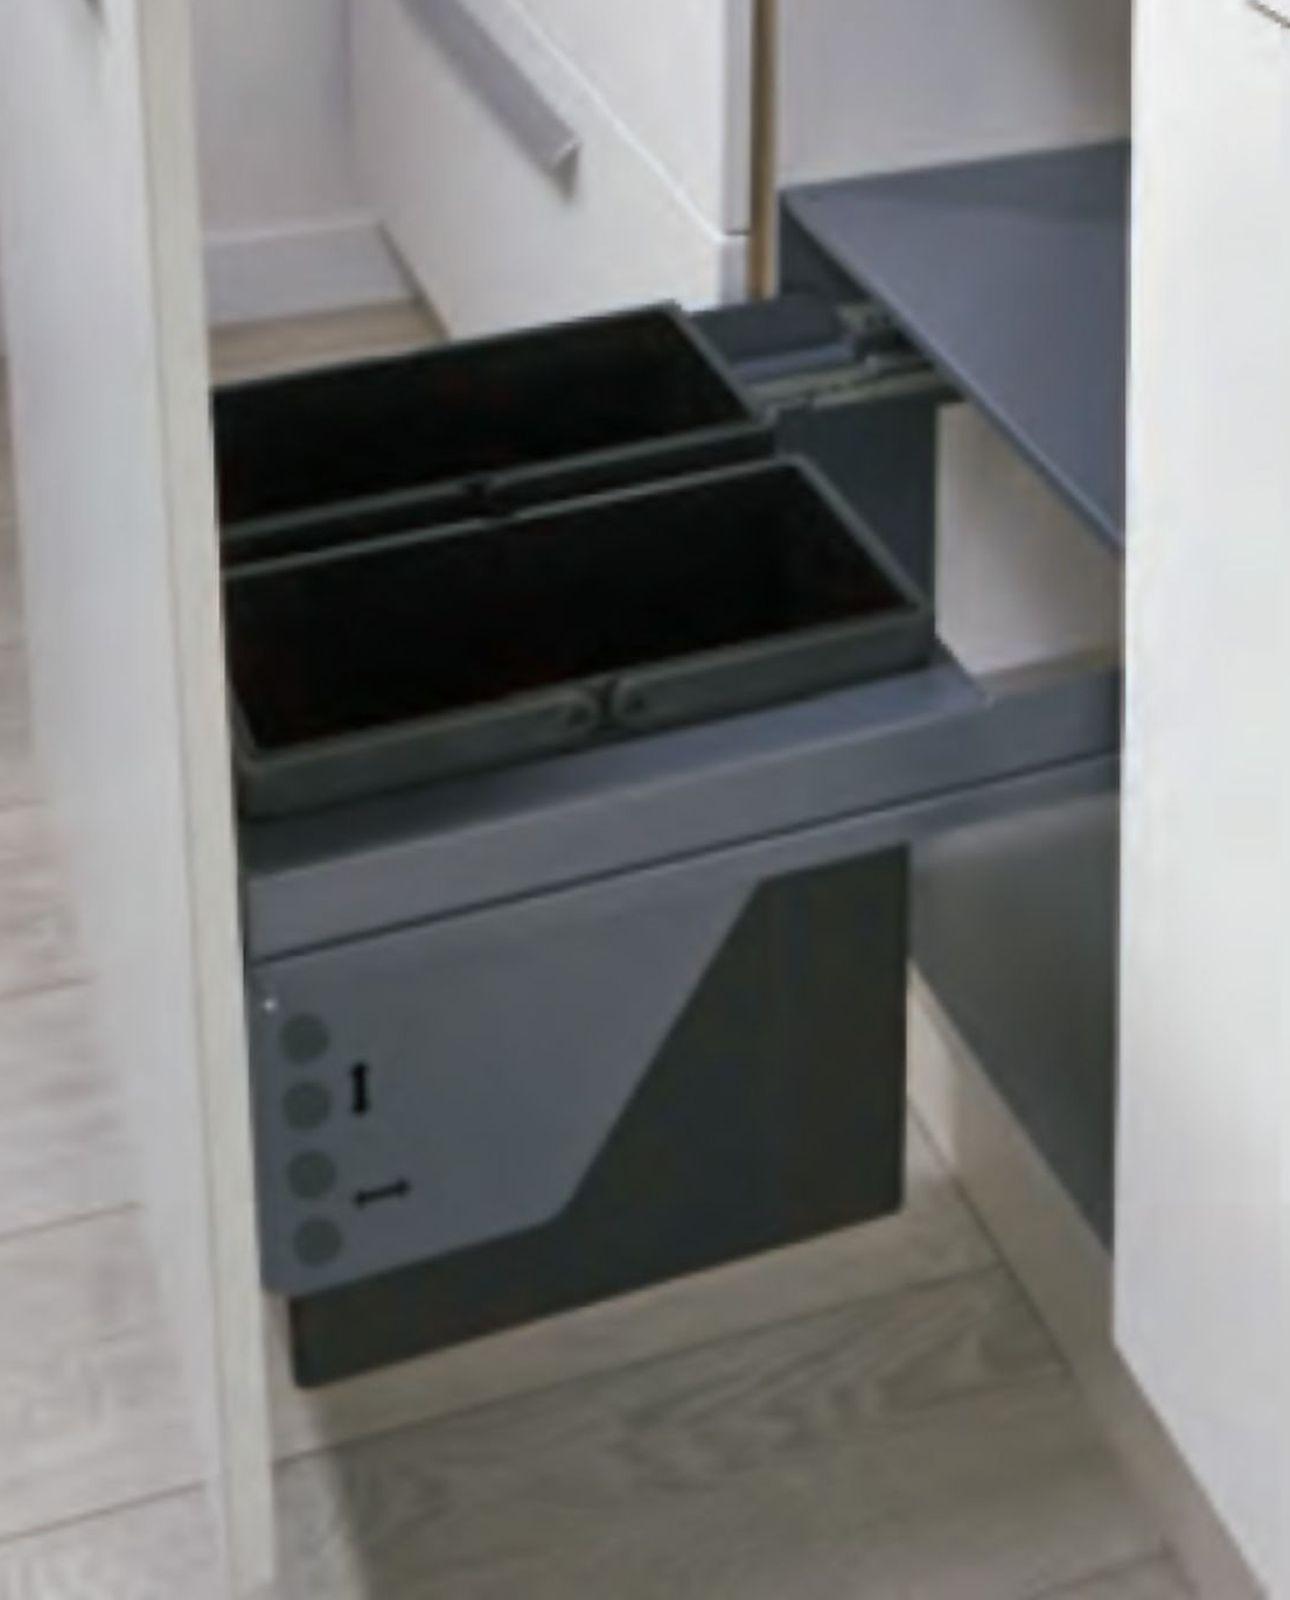 kche mlleimer gallery of cheap mlleimer kche einbau bnbnewsco kche with mlleimer system with. Black Bedroom Furniture Sets. Home Design Ideas